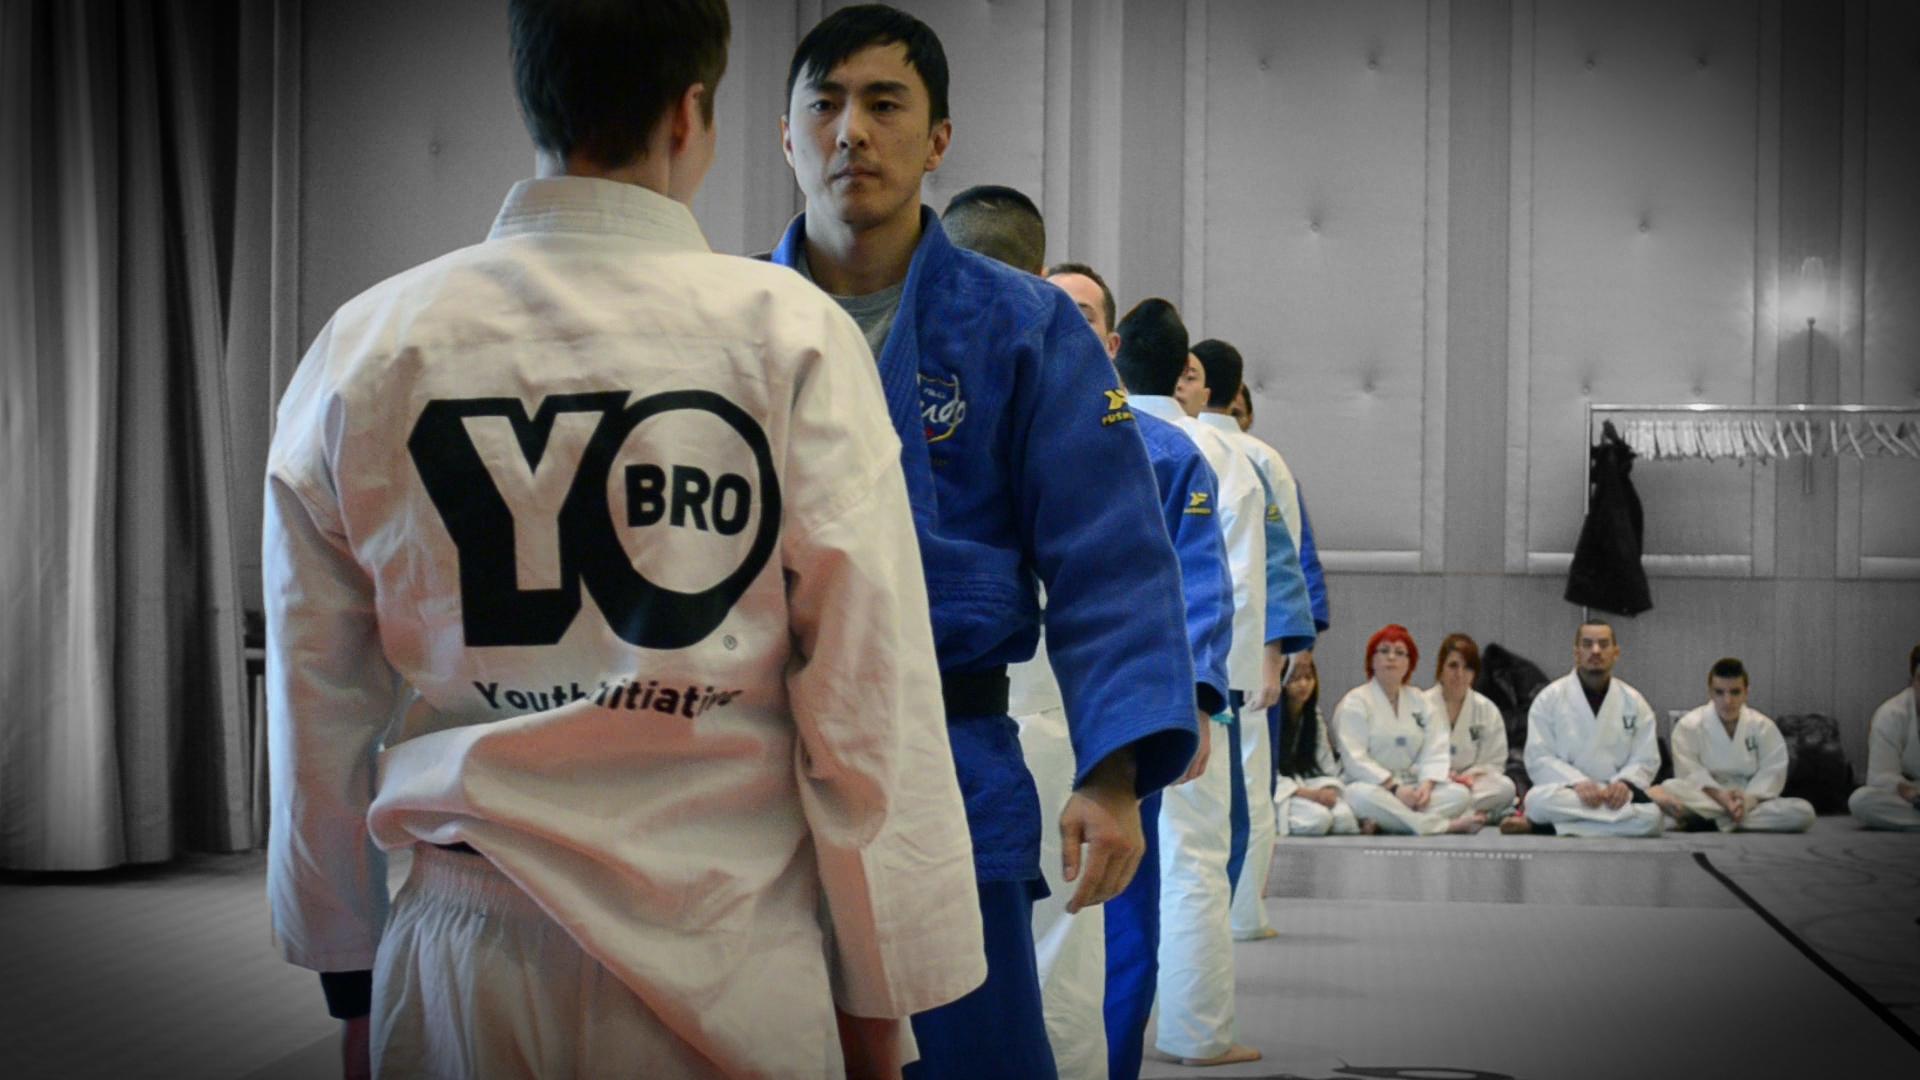 Yo Bro Yo Girl Youth Initiative: A Proven Solution    Yo Bro Yo Girl Impact